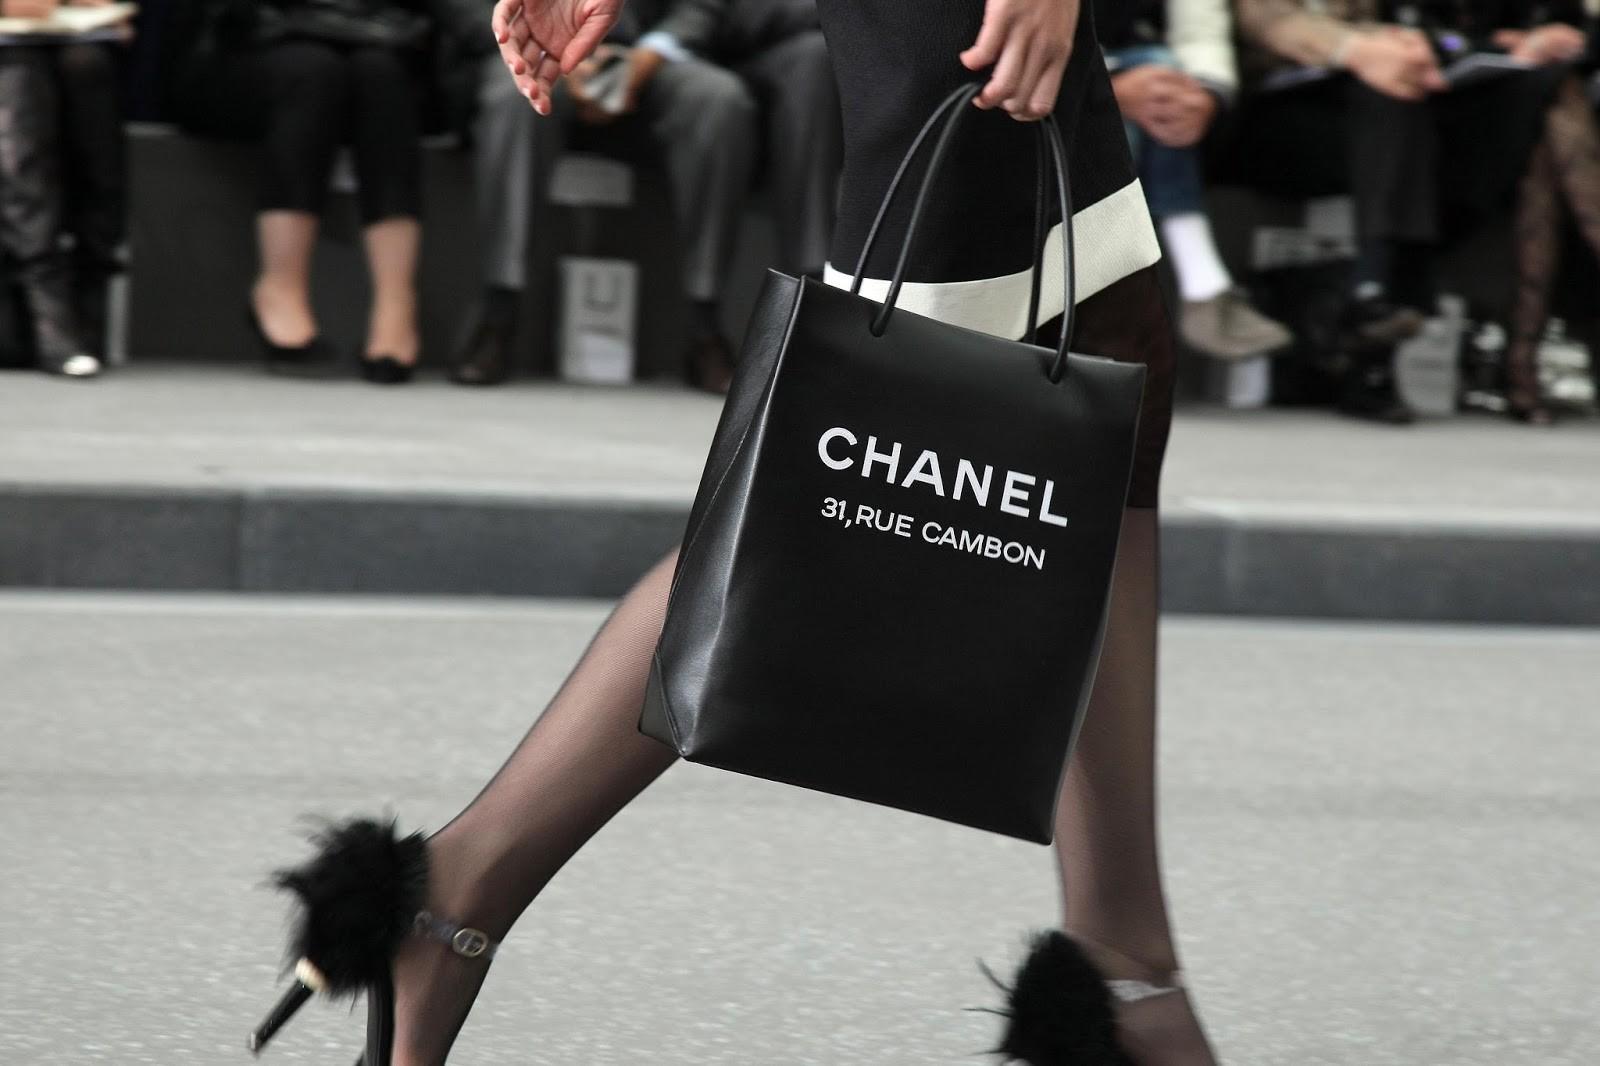 chanel shopping best citites shoppping world